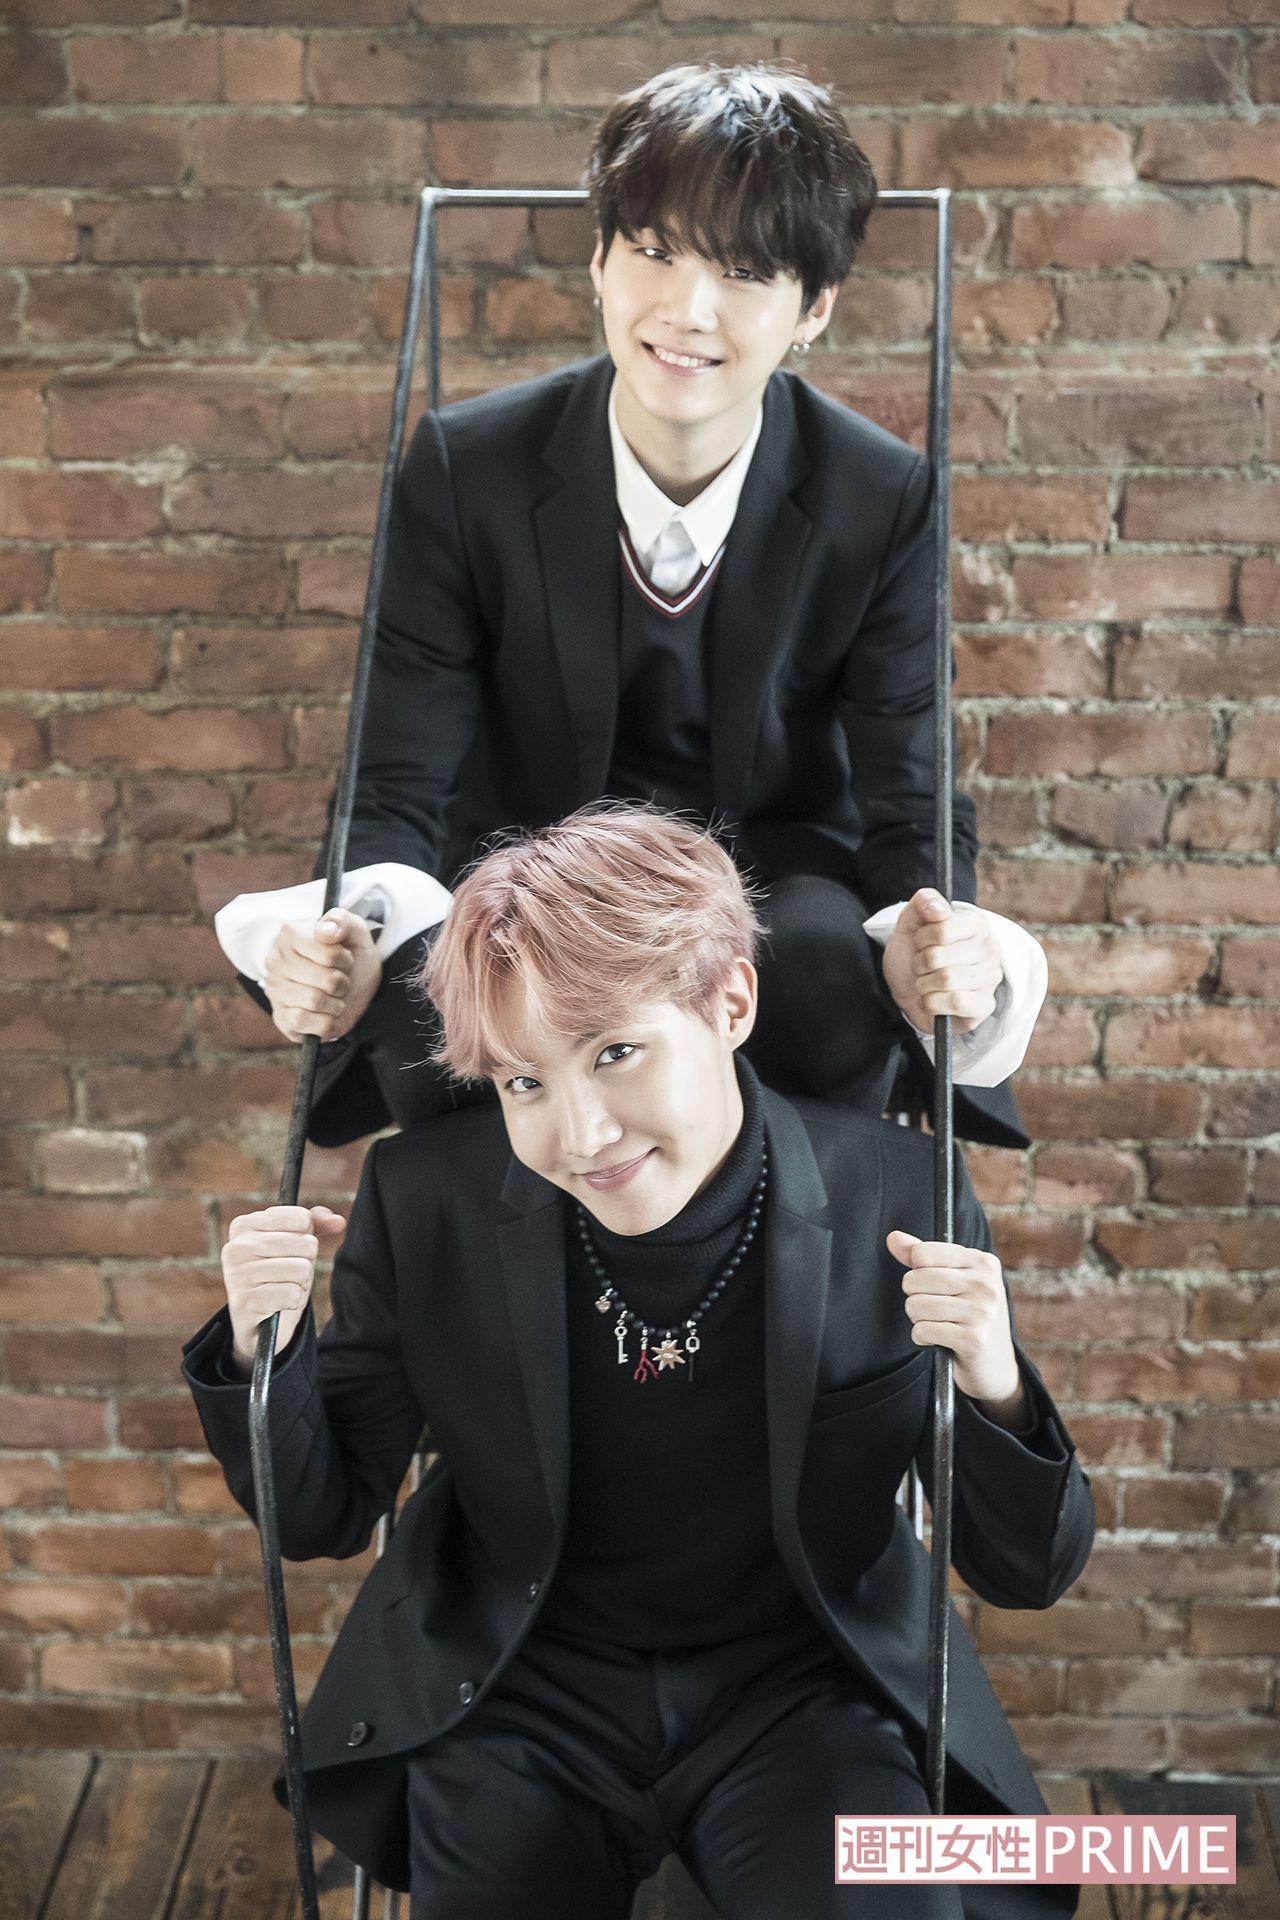 Ho Seok y Yoon Gi de BTS admiten tener algo .